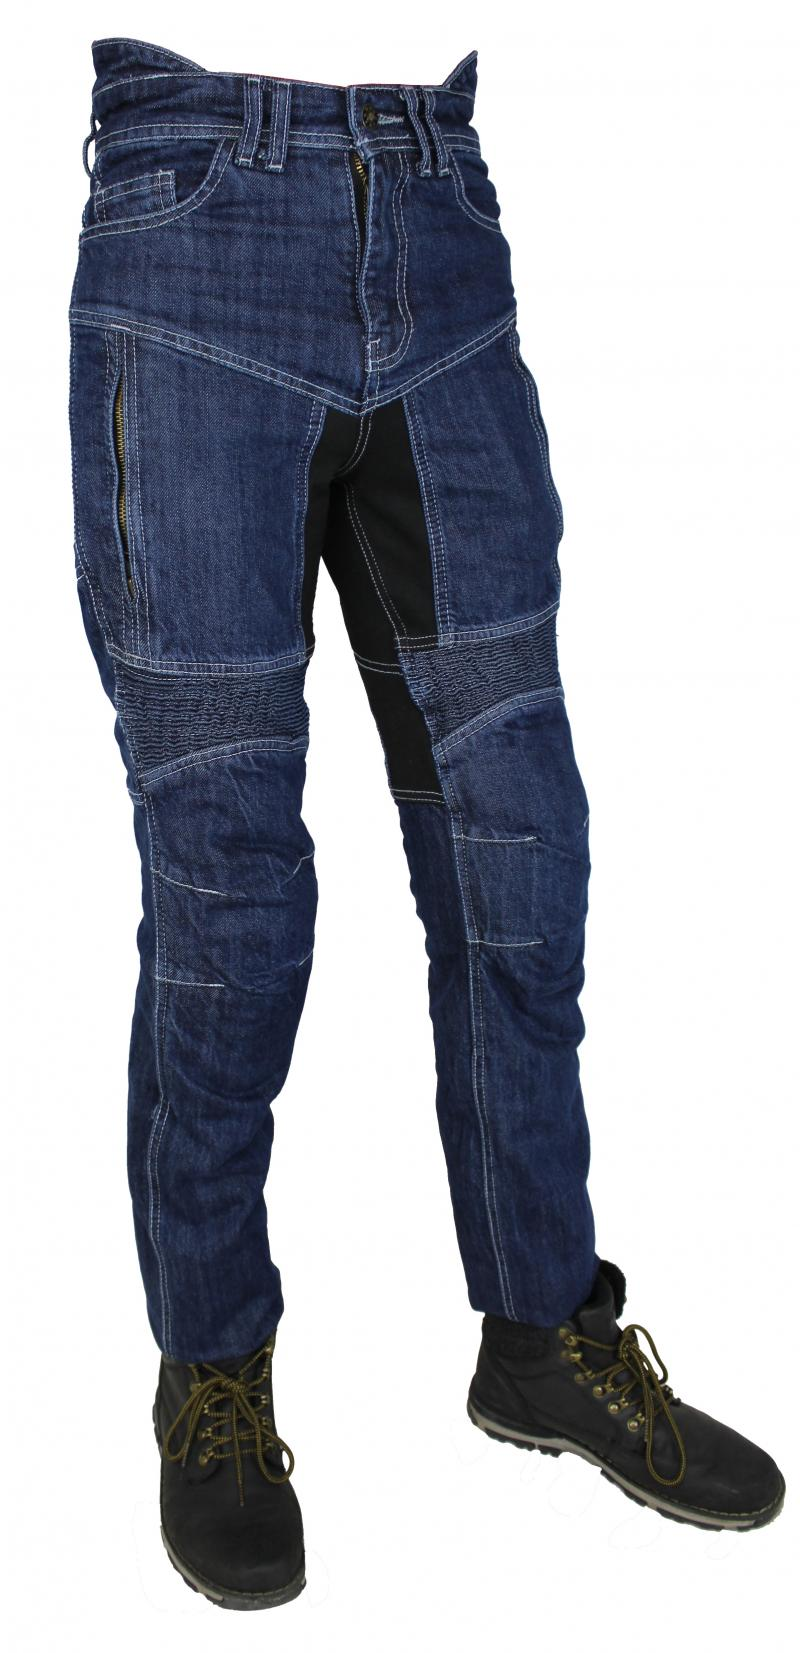 Motorrad Biker Jeans Hose Mit Kev Aramid Protektoren Navy Blau